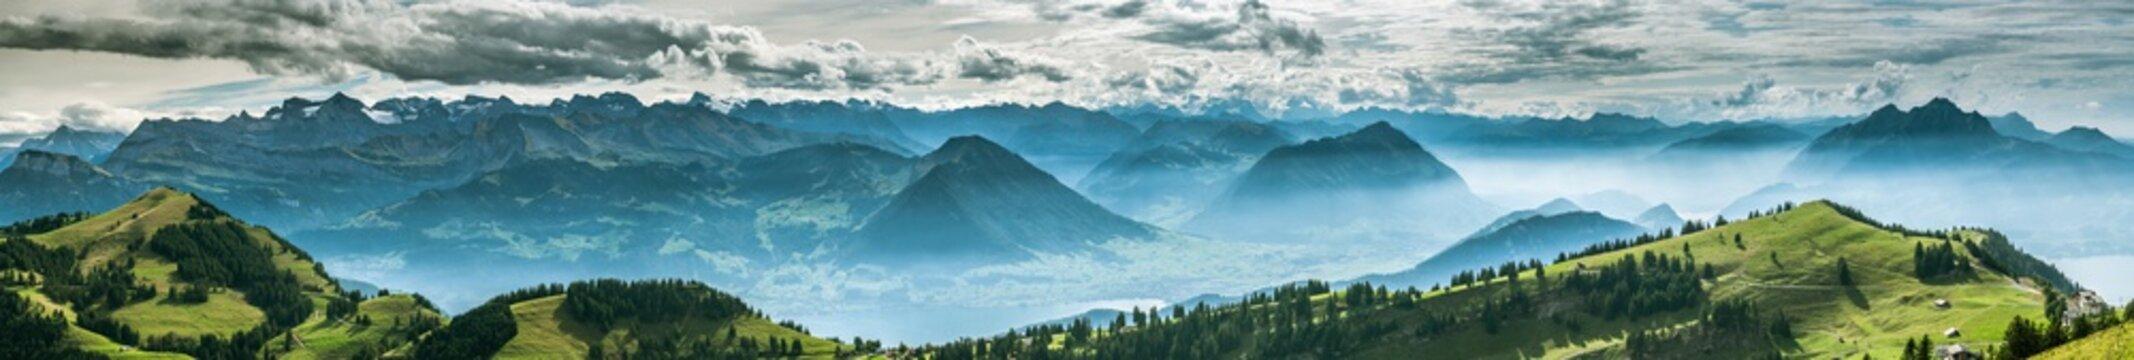 Panoramic view on beautiful Swiss Alps surrounding Lake Lucerne